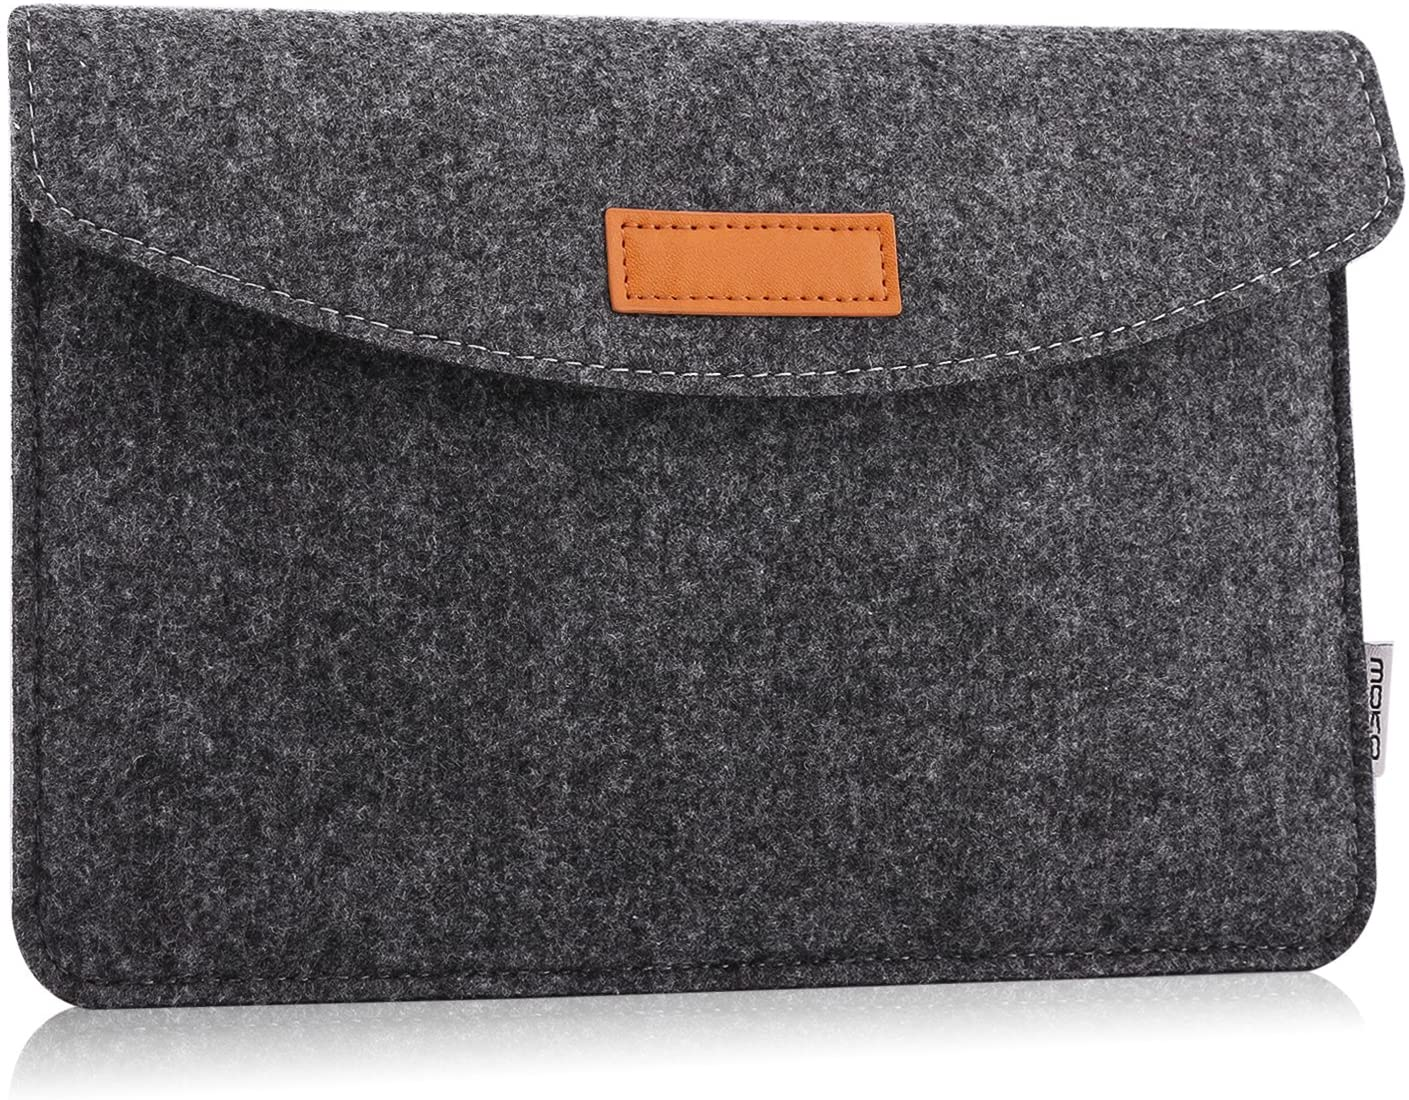 MoKo 7-8 Inch Sleeve Bag, Portable Carrying Protective Felt Tablet Case Cover, for iPad Mini 1/2 /3/4, Lenovo Tab 4 8.0, Samsung Galaxy Tab S2 8.0, Tab A 8.0, Neutab 7